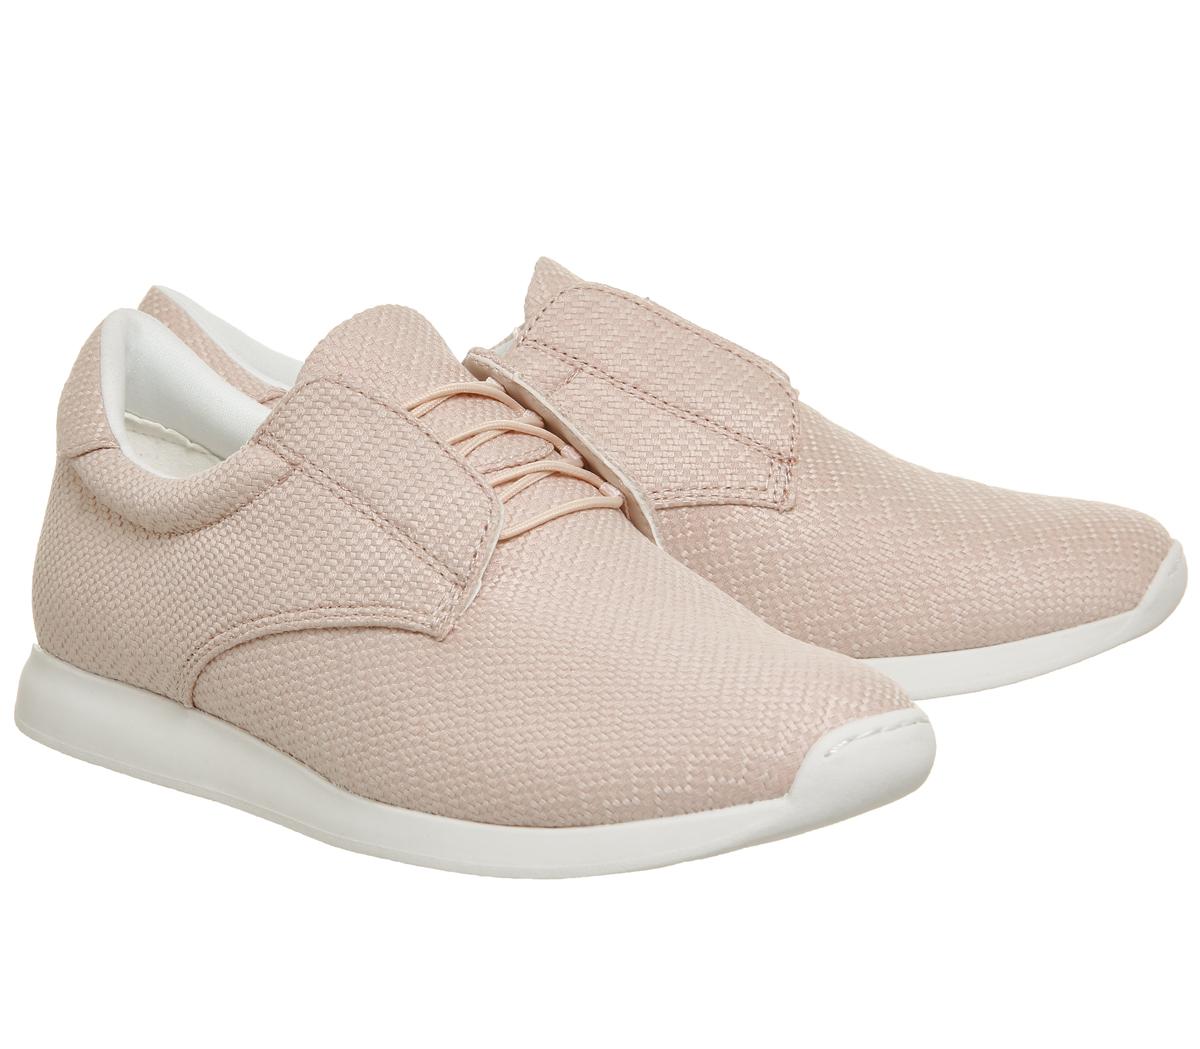 Damenschuhe Vagabond Kasai 2.0 Lace Runner MILKSHAKE Trainers Schuhes